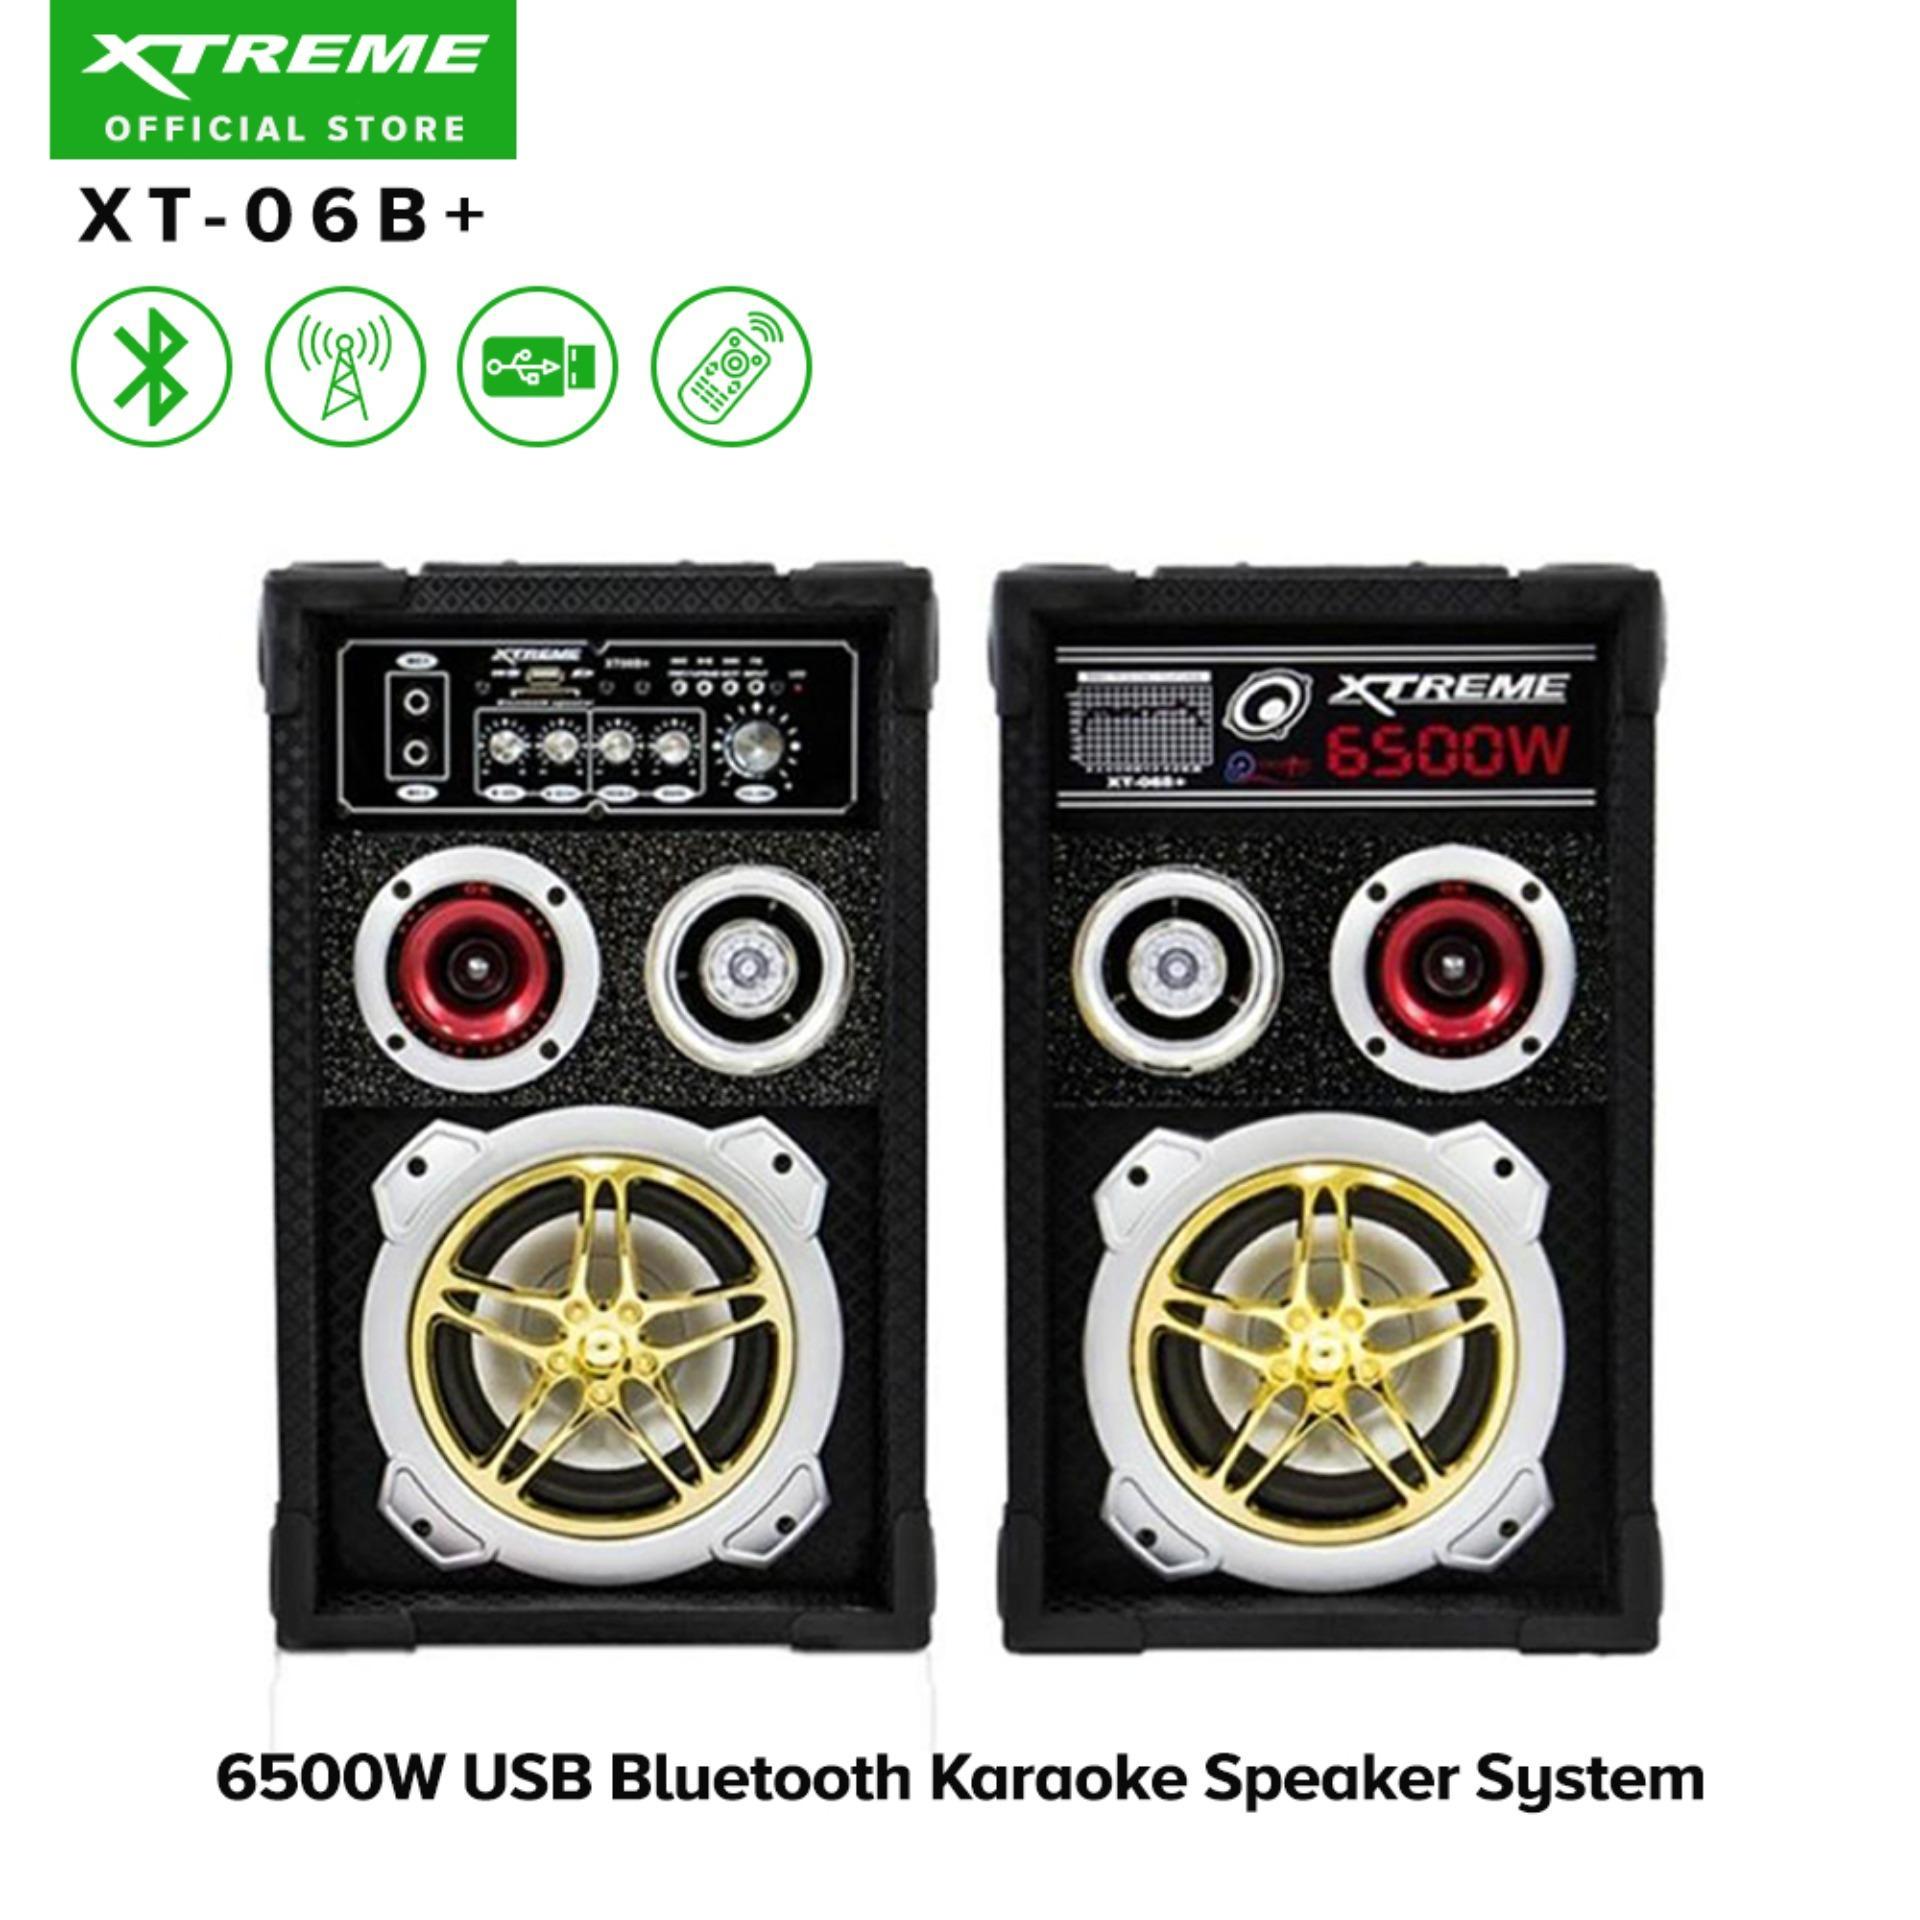 XTREME XT-06B+ 6500W USB Bluetooth Karaoke Speaker System (Black)